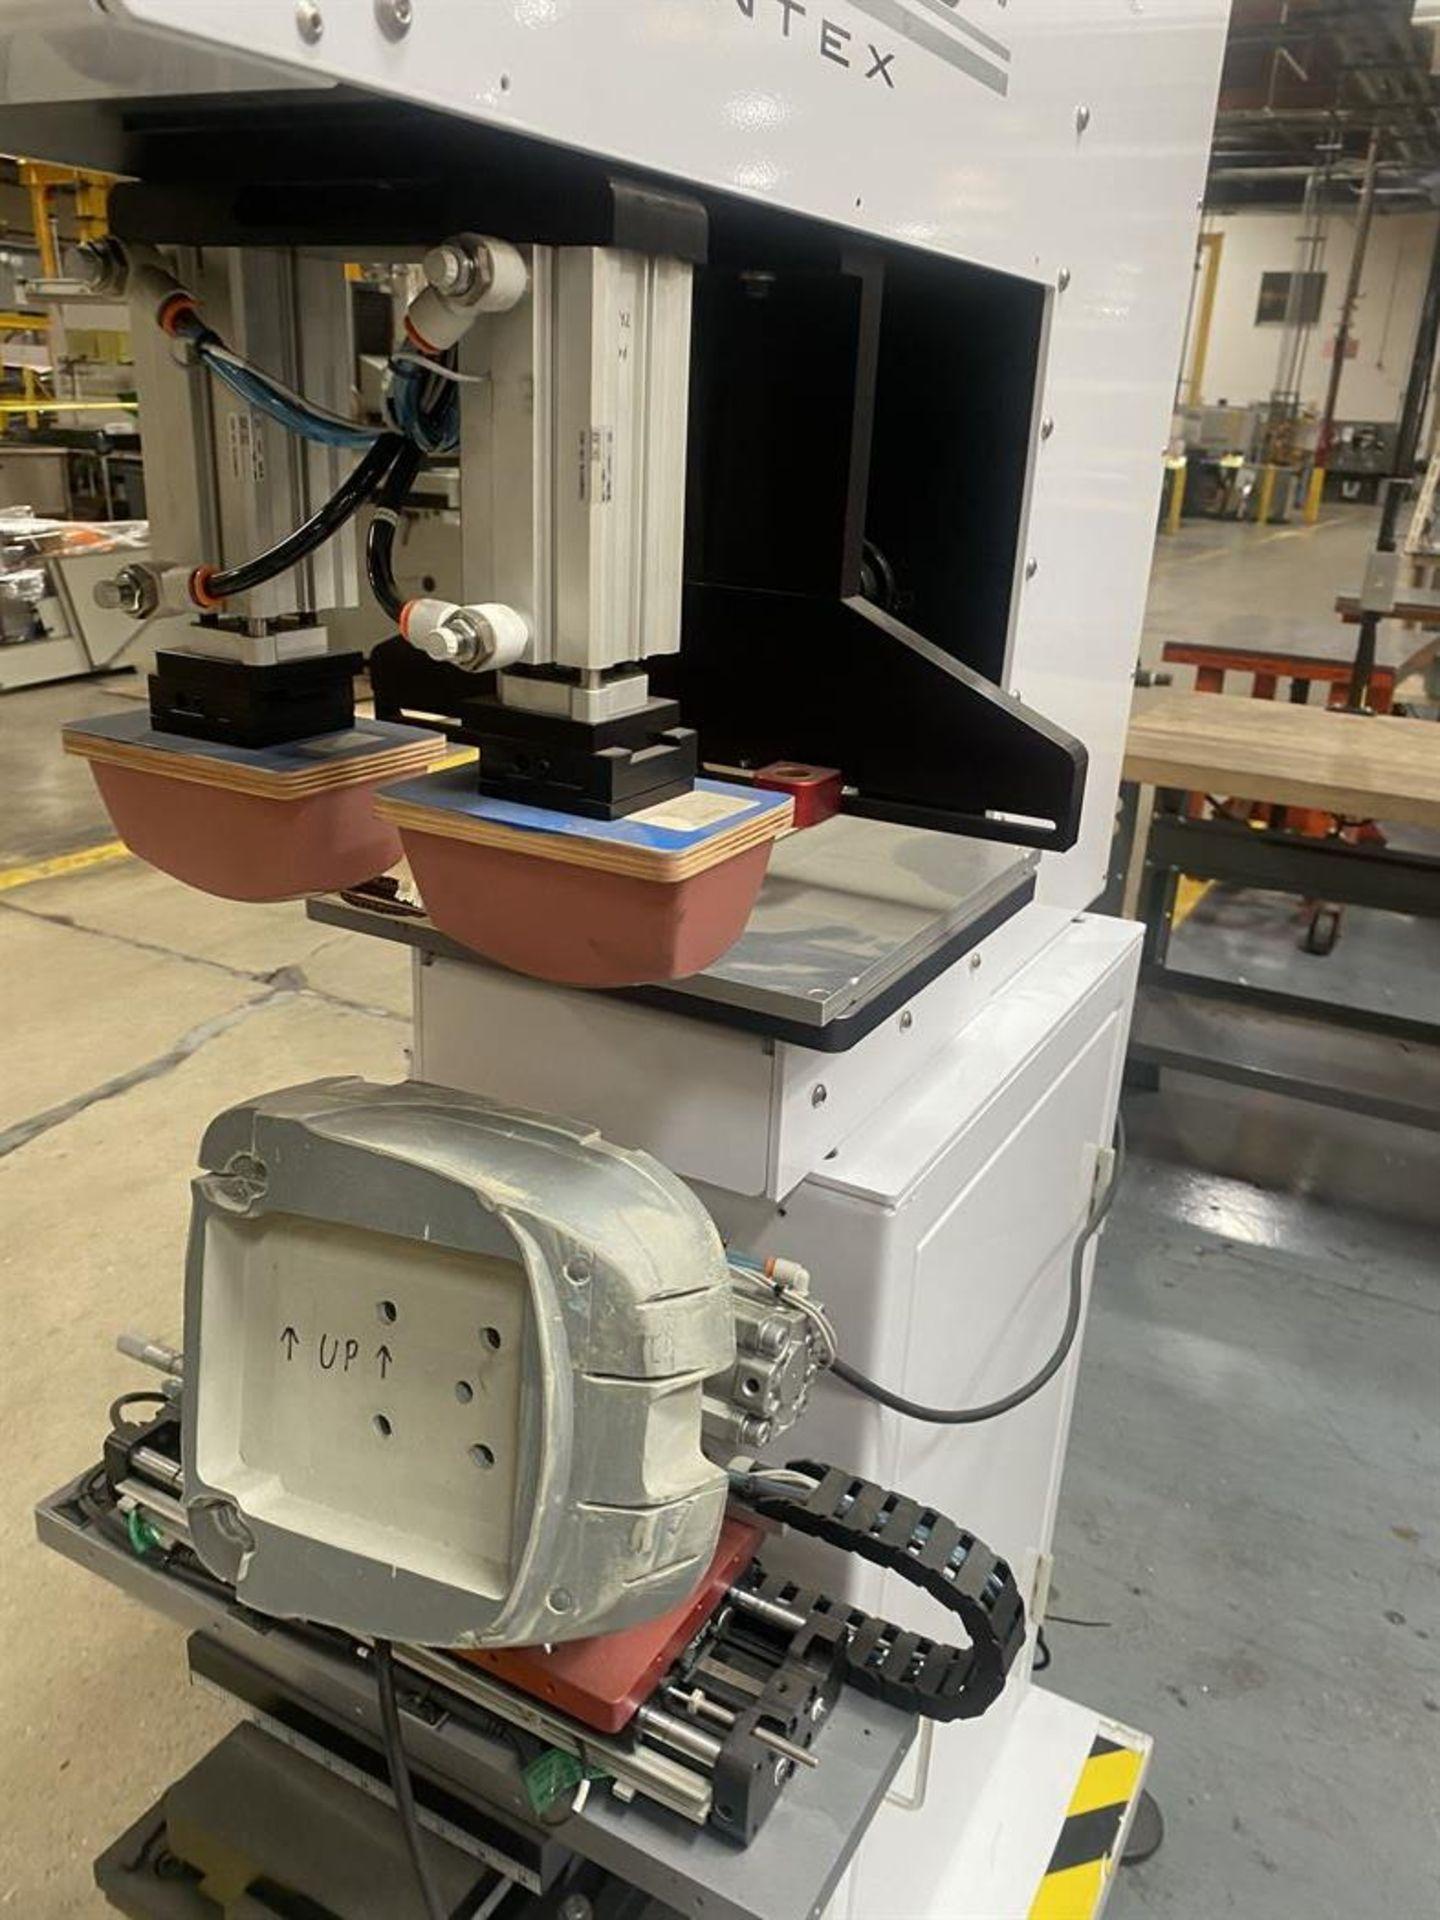 Lot 84 - Printex G8-150 MK II Multi-Function Pad Printing Machine, s/n na, Mitsubishi GOT1000 PLC